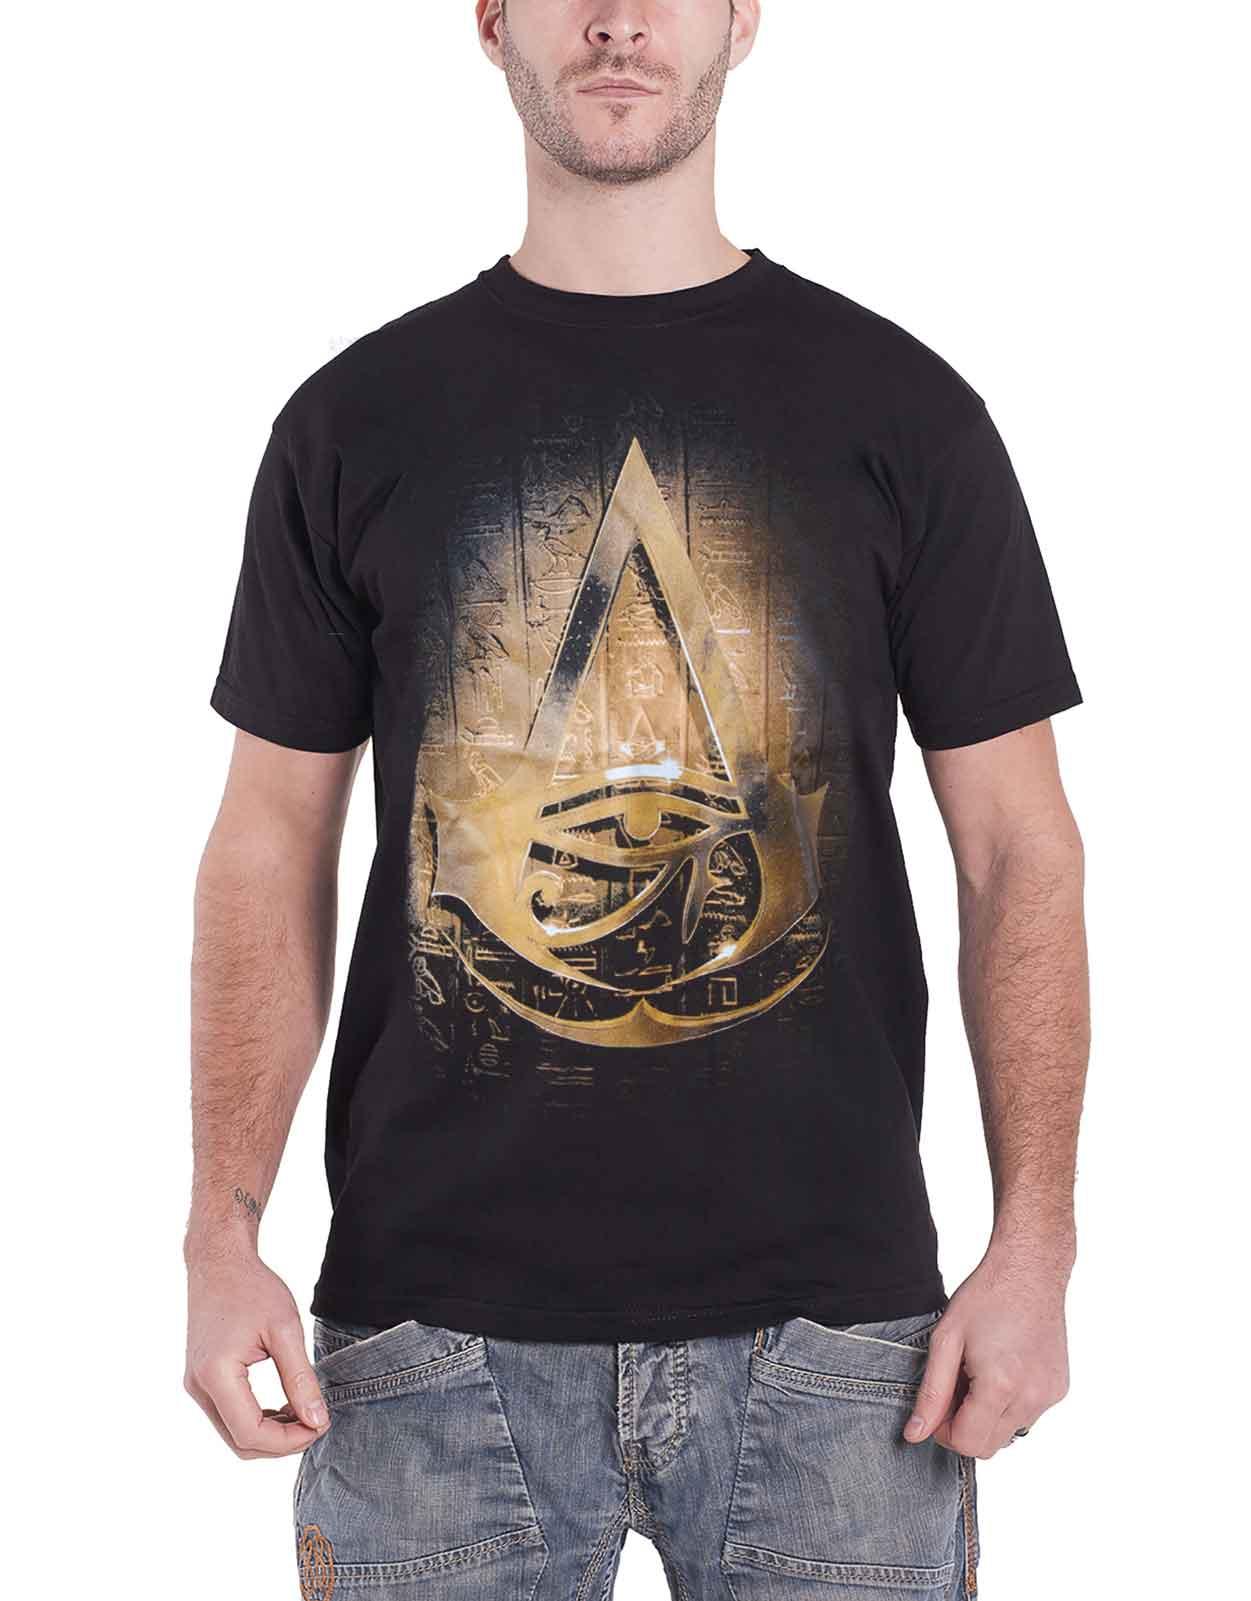 d548caf9 Image is loading Assassins-Creed-T-Shirt-Hieroglyph-Crest-Origins-new-